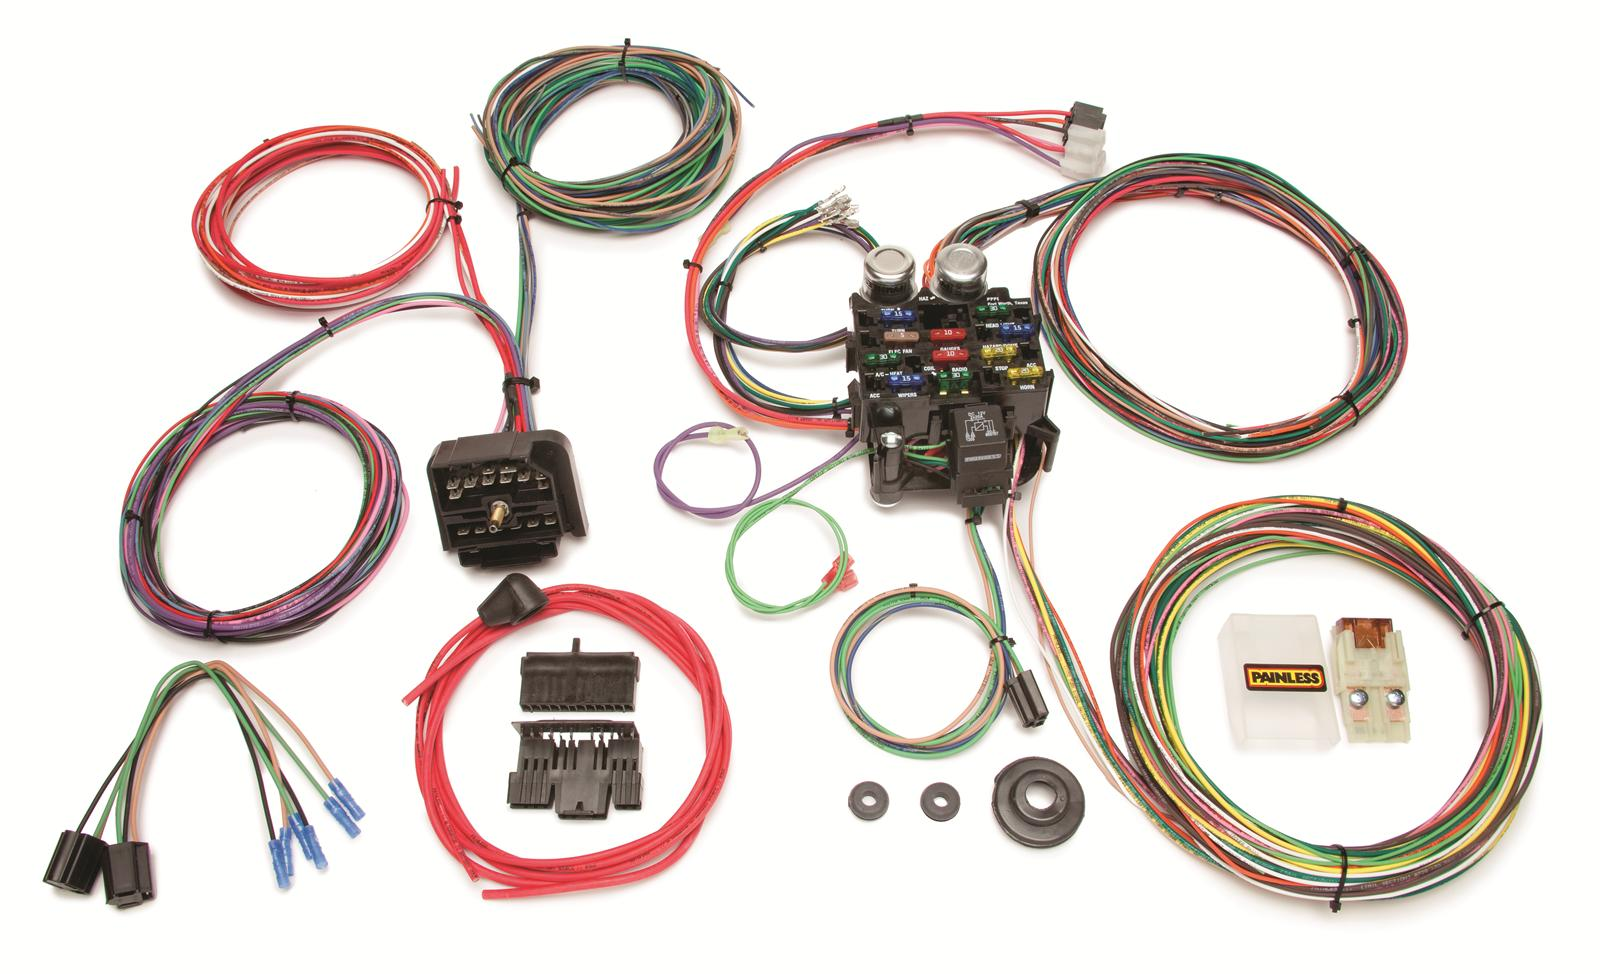 hight resolution of centech wiring harness jeep cj7 wiring diagrams thecen tech wiring harness jeep cj wiring diagram centech